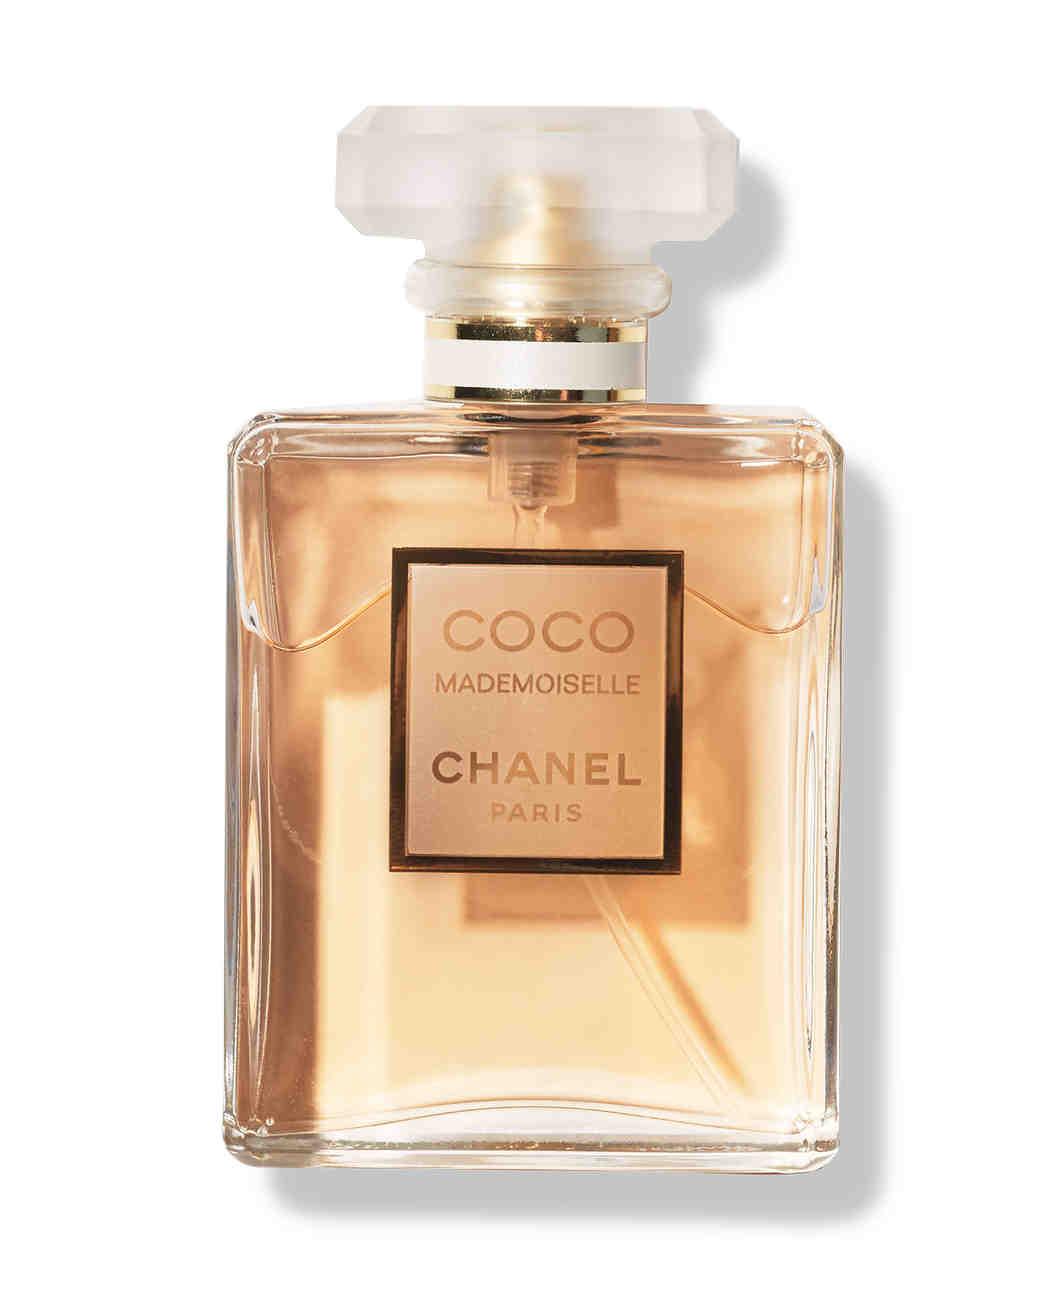 perfume-1-product-313-d111715.jpg